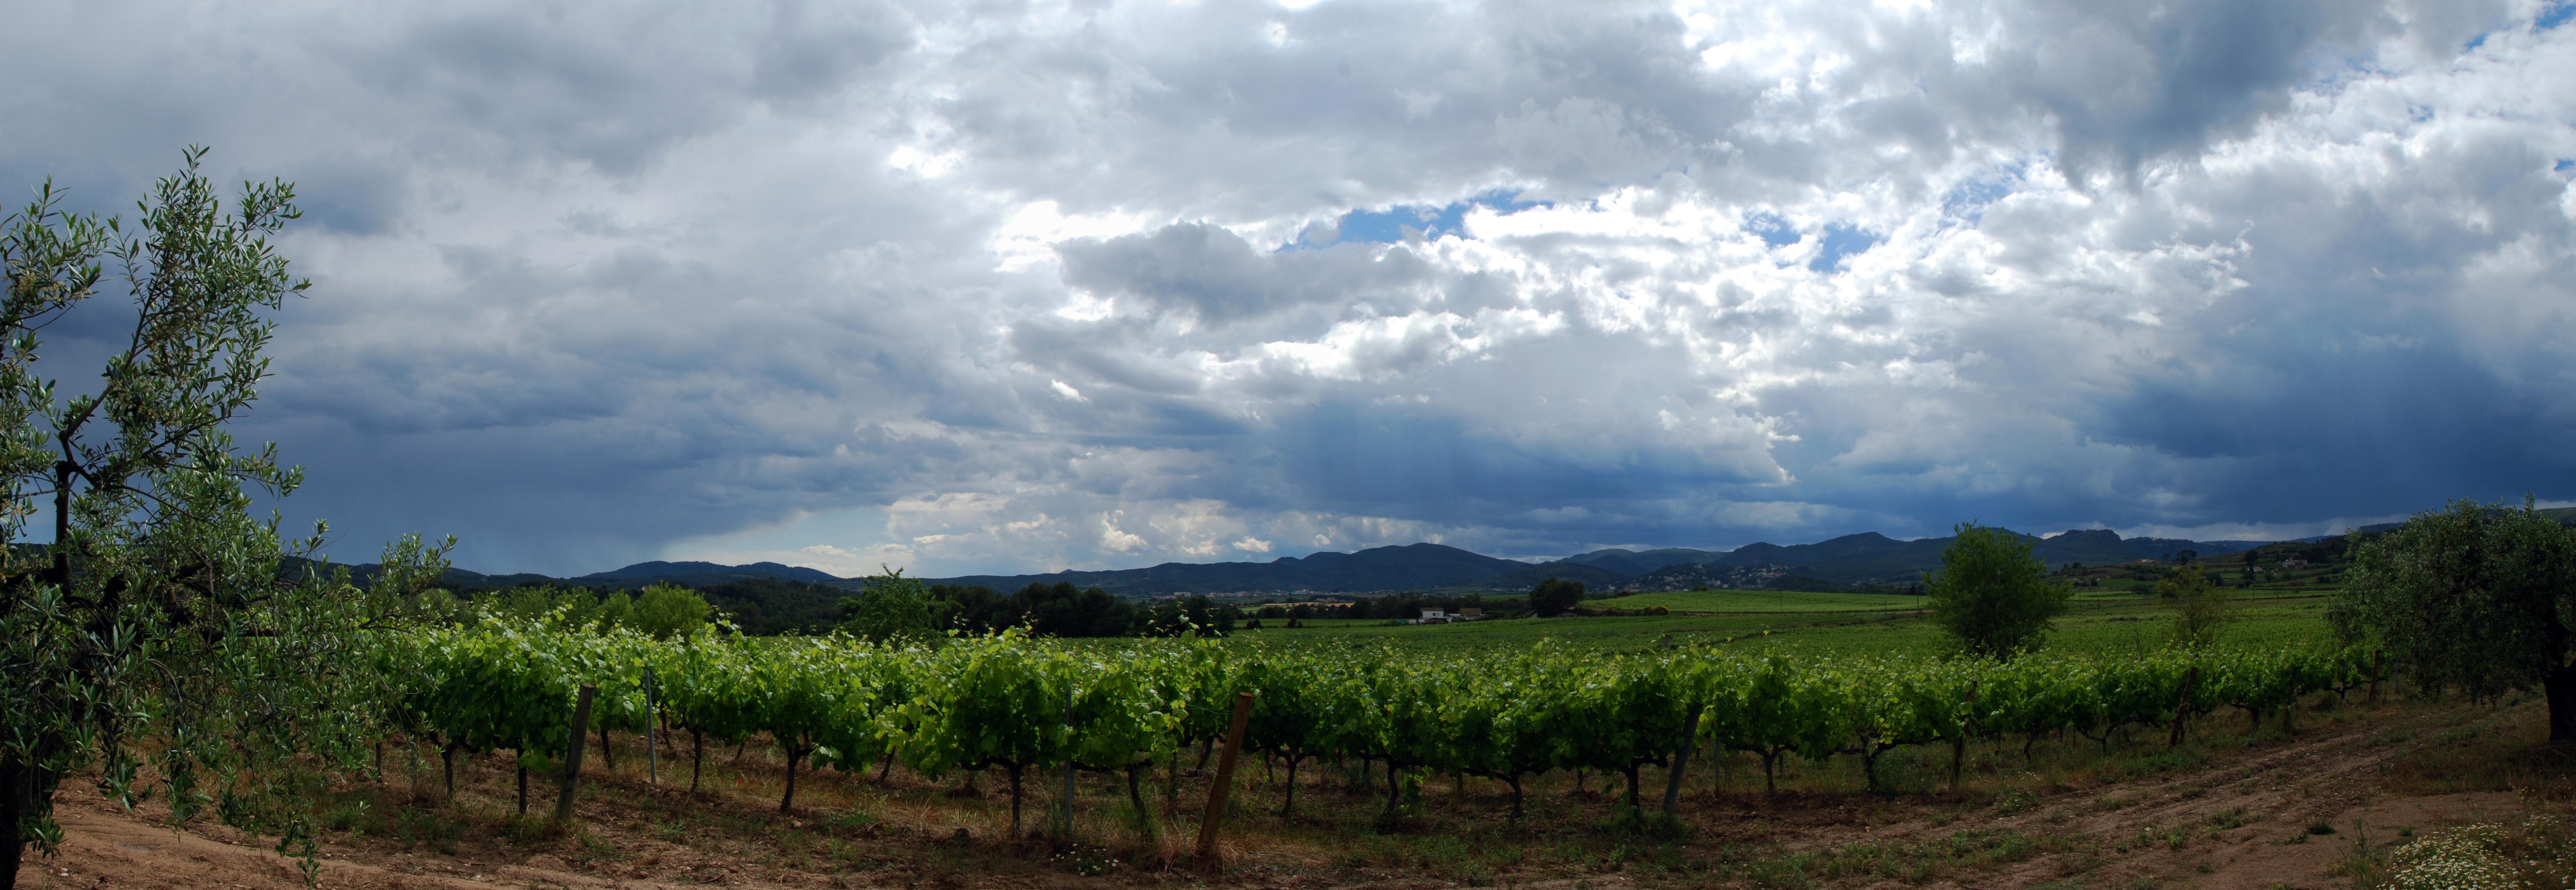 Penedes wine region